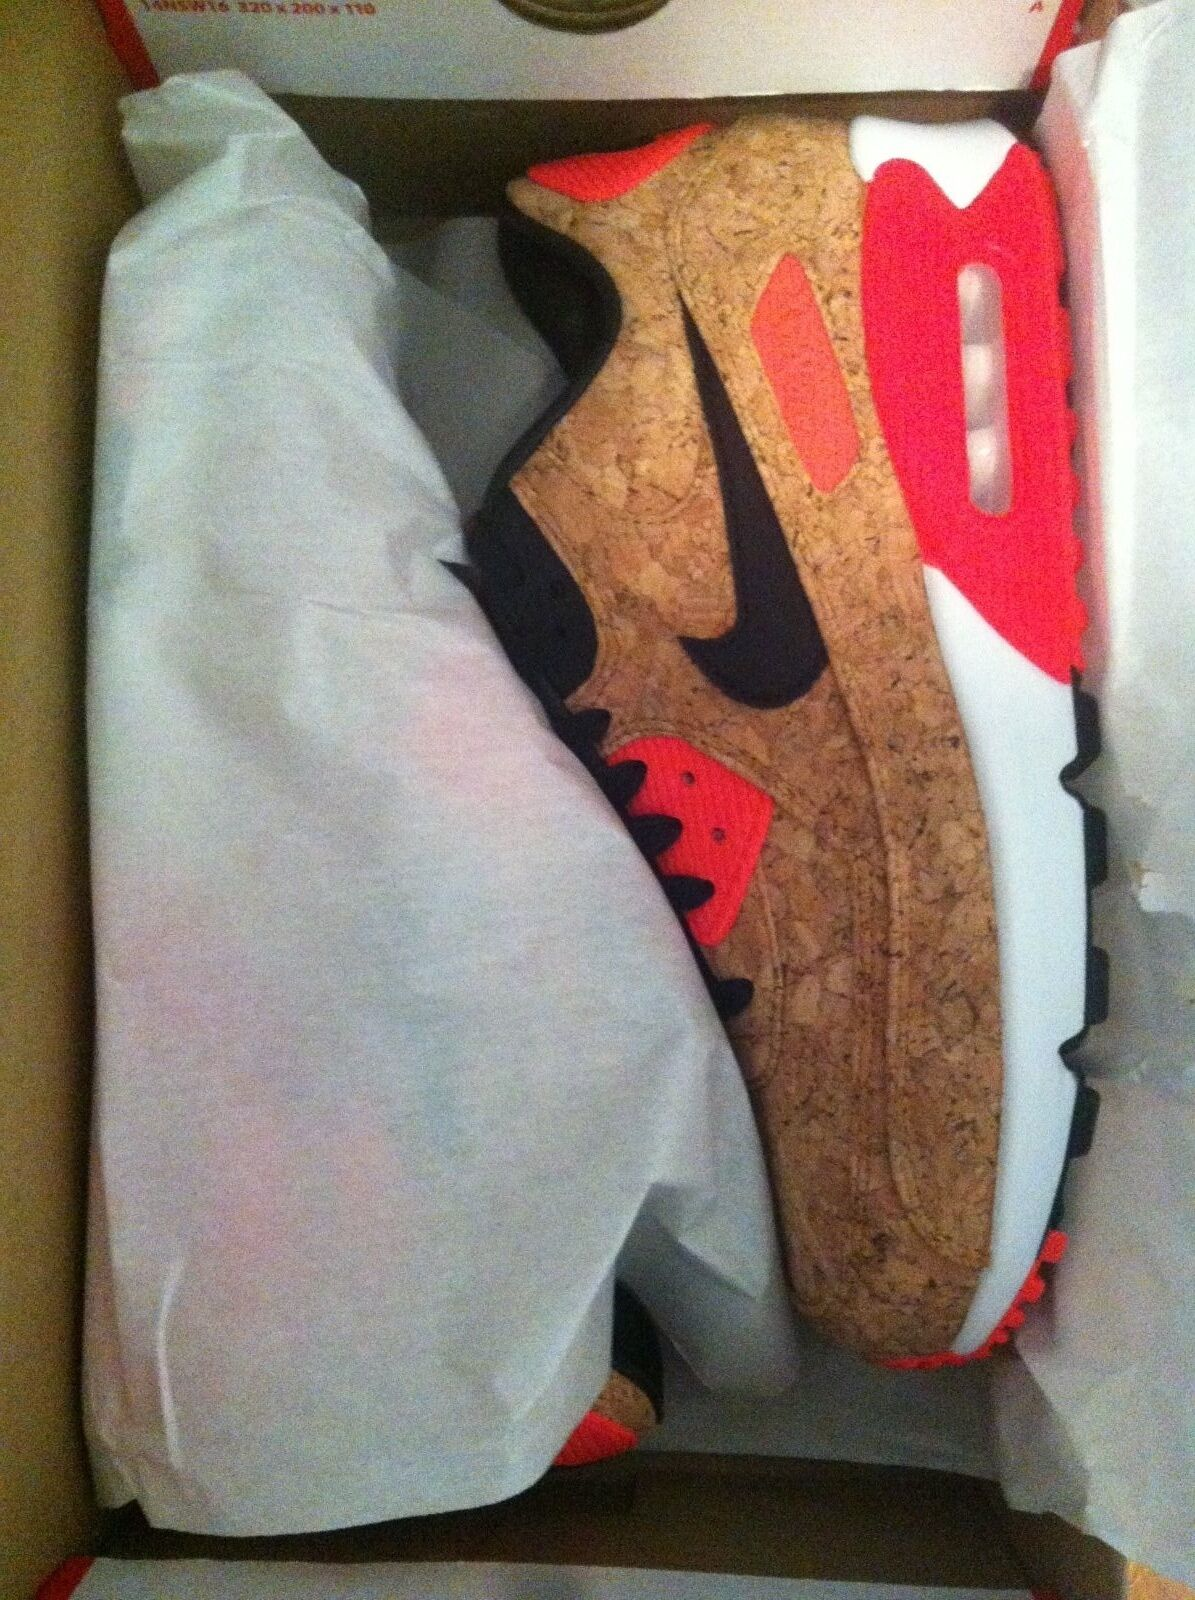 DS Nike Air Max 90 Anniversary Cork 90 Size 8 Bronze infrared 90 725235-706